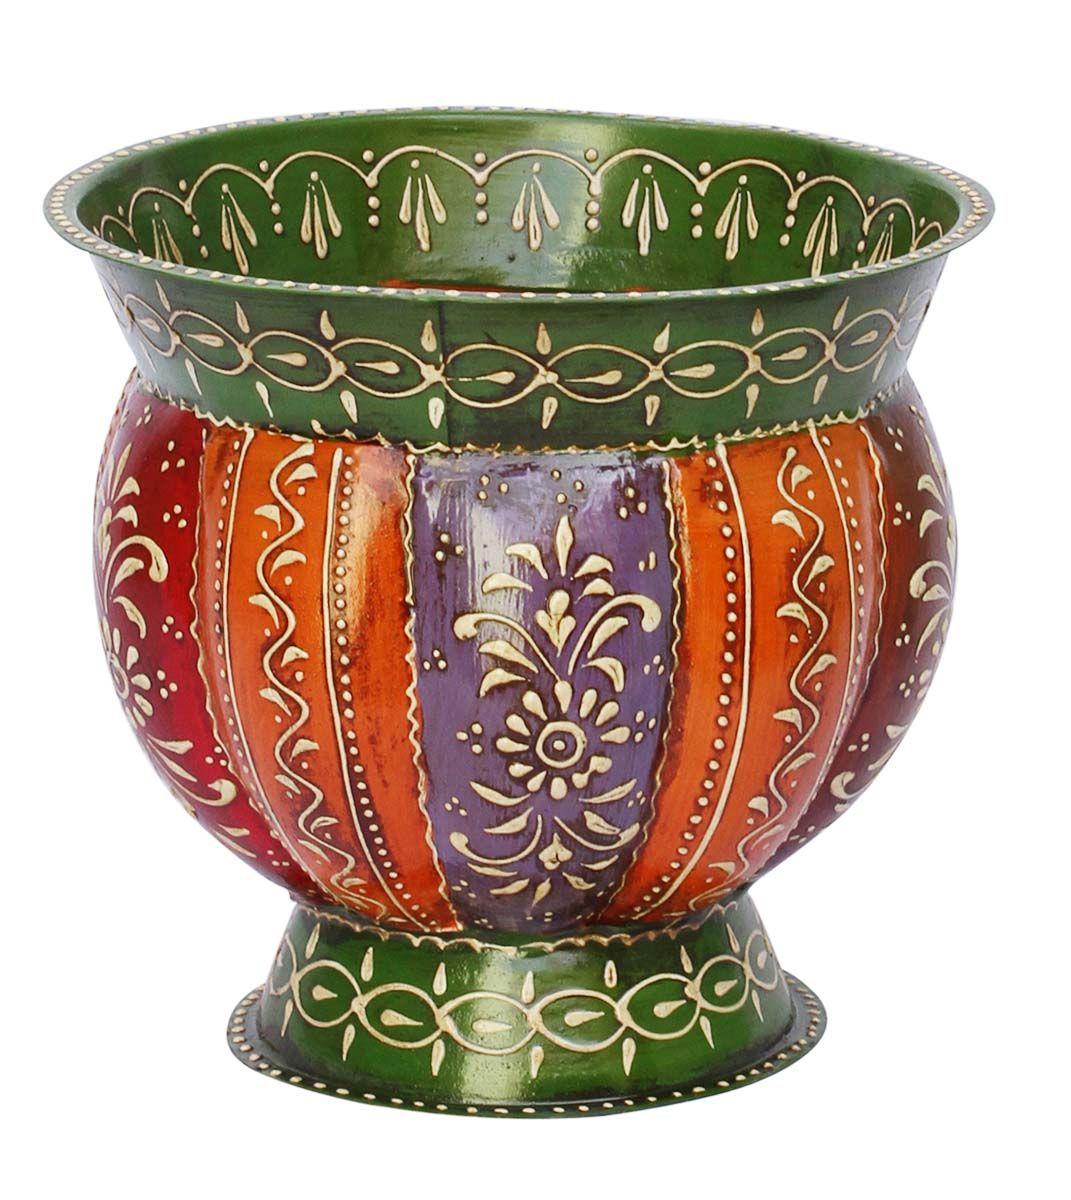 "Bulk Wholesale Handmade Pumpkin Shaped 7.4"" Flower Vase"